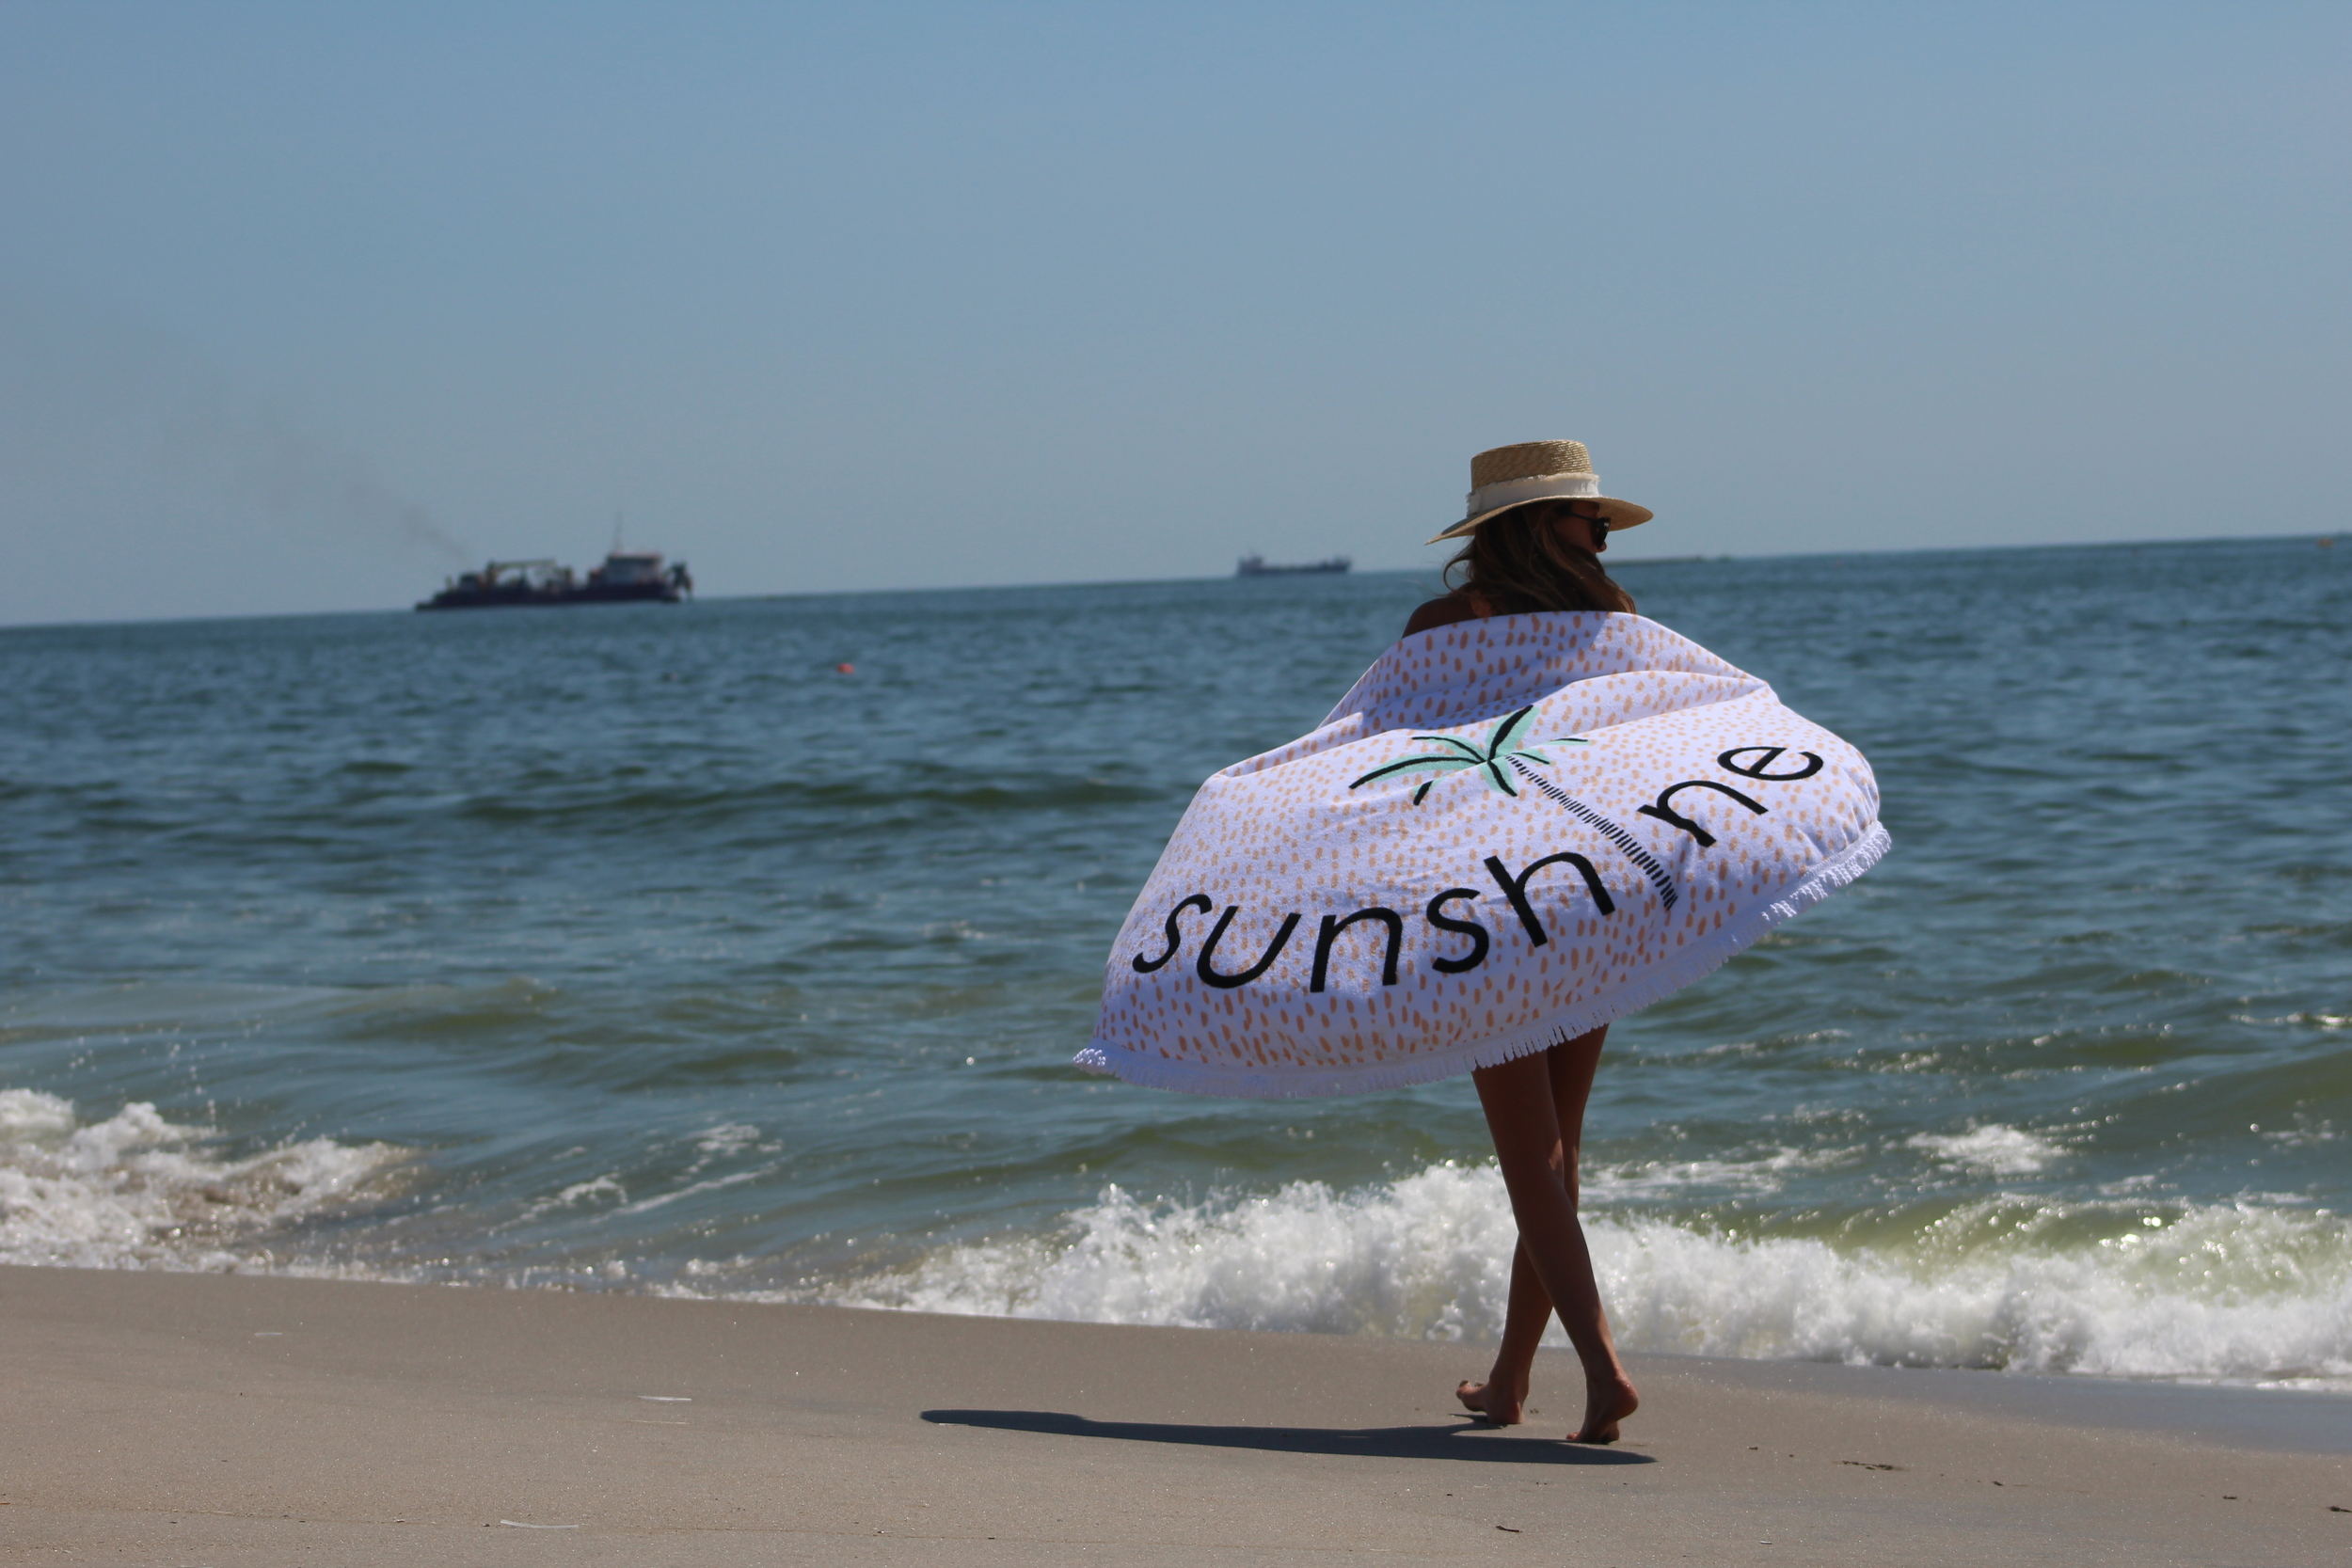 Lolli swim beach towel